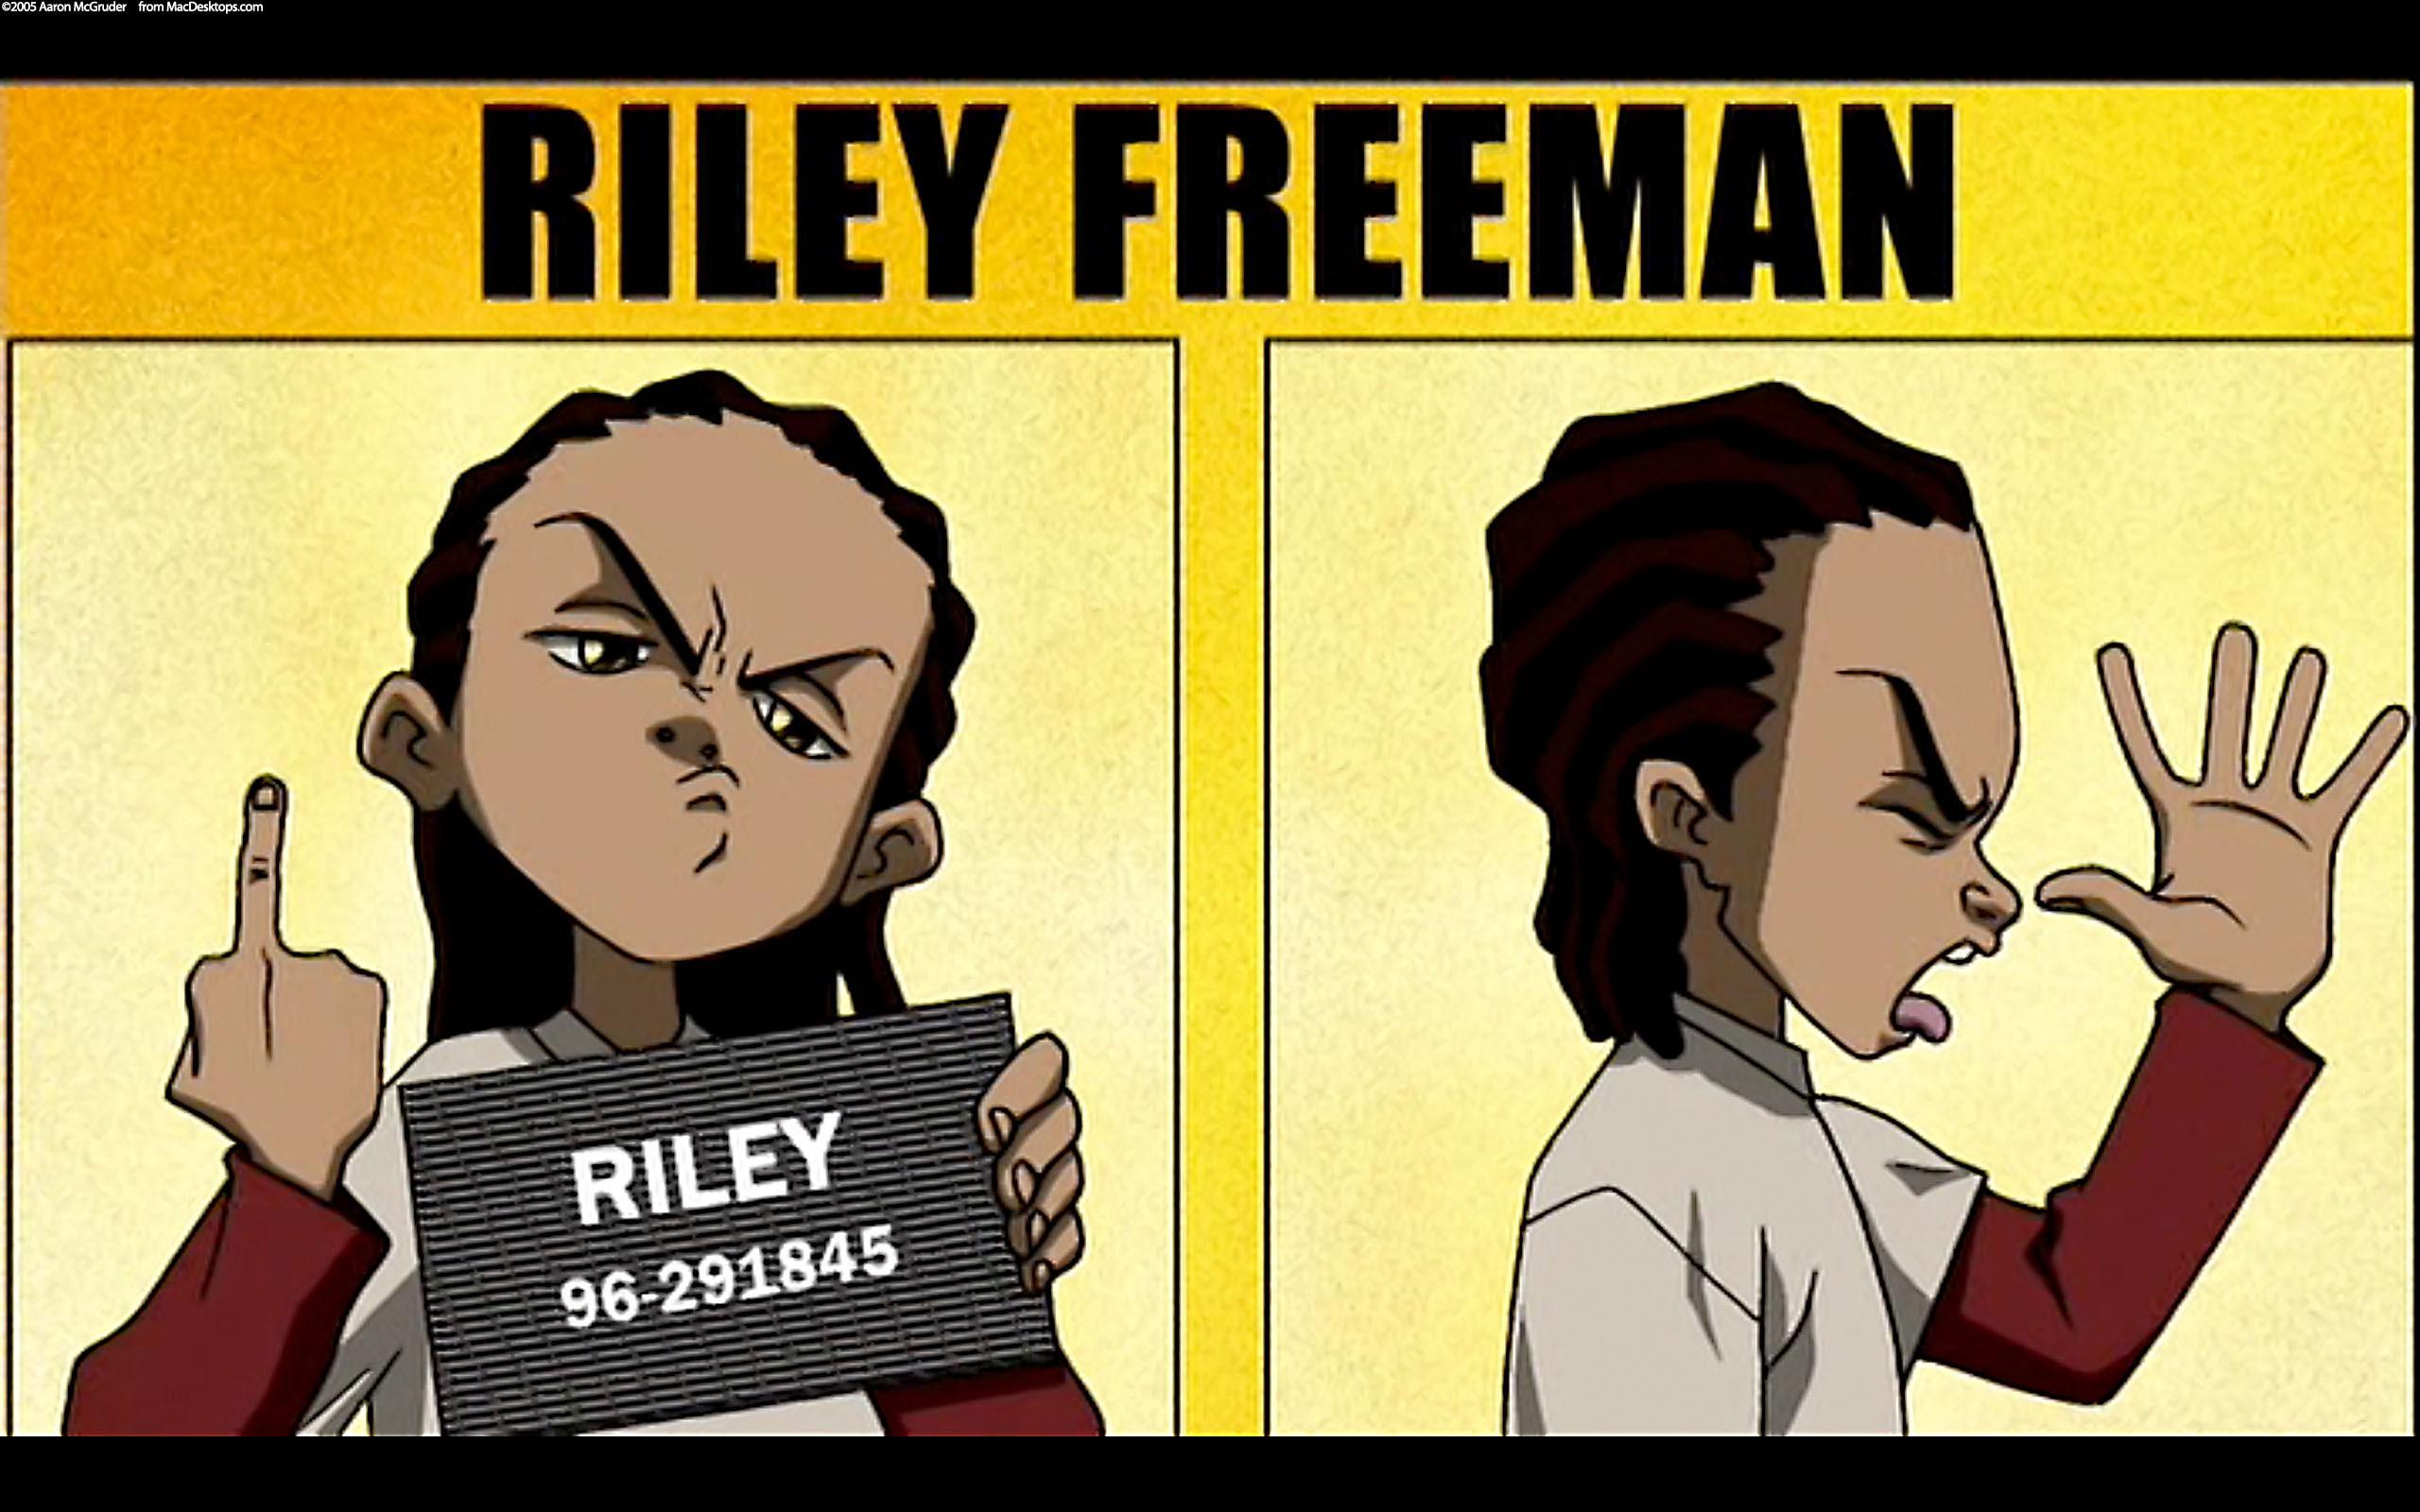 Riley Freeman Boondocks, Boondocks season 1, Intro youtube